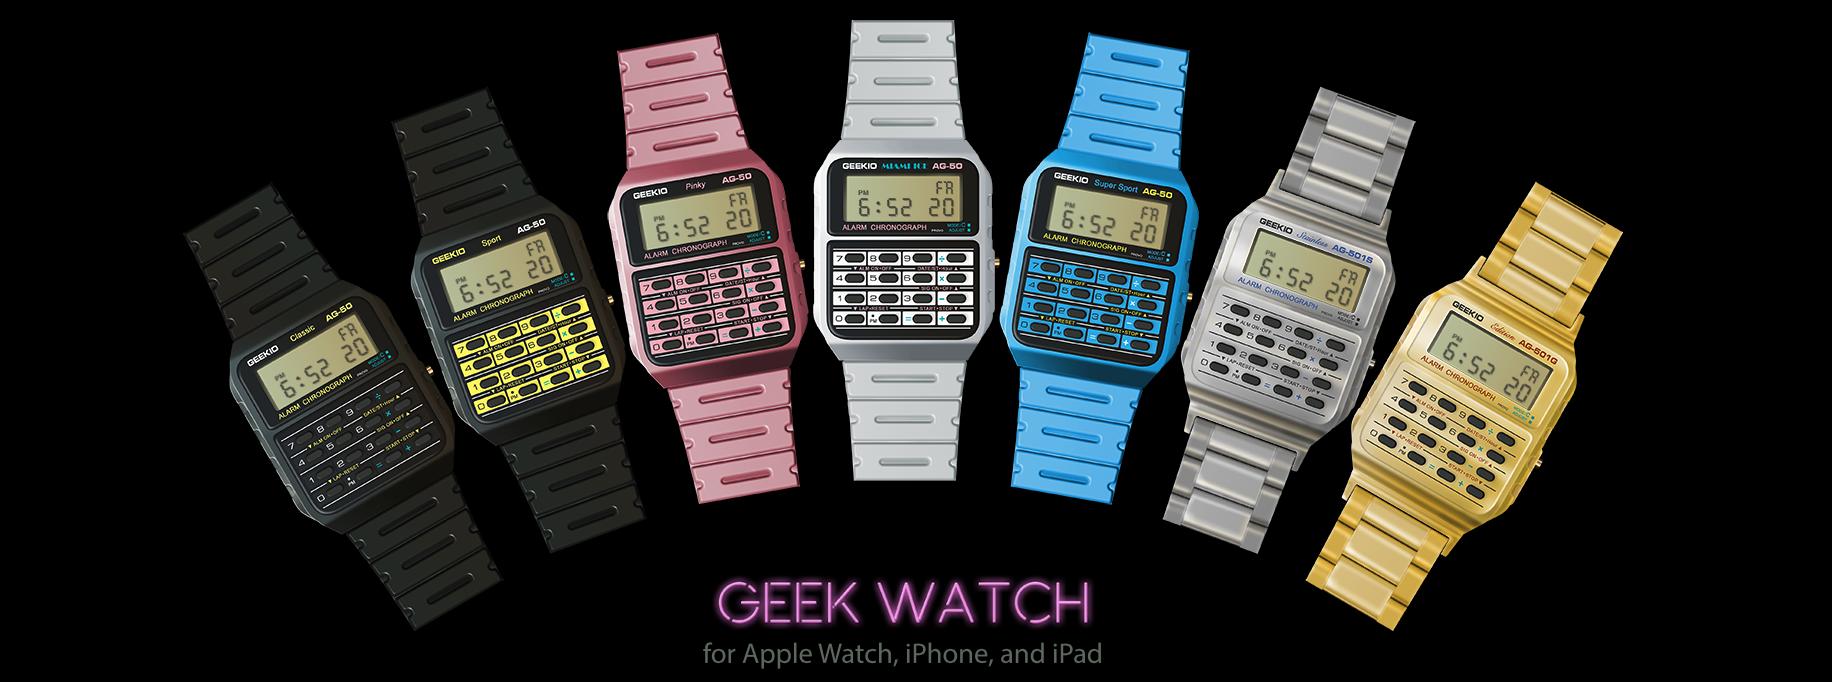 geek_watch_banner